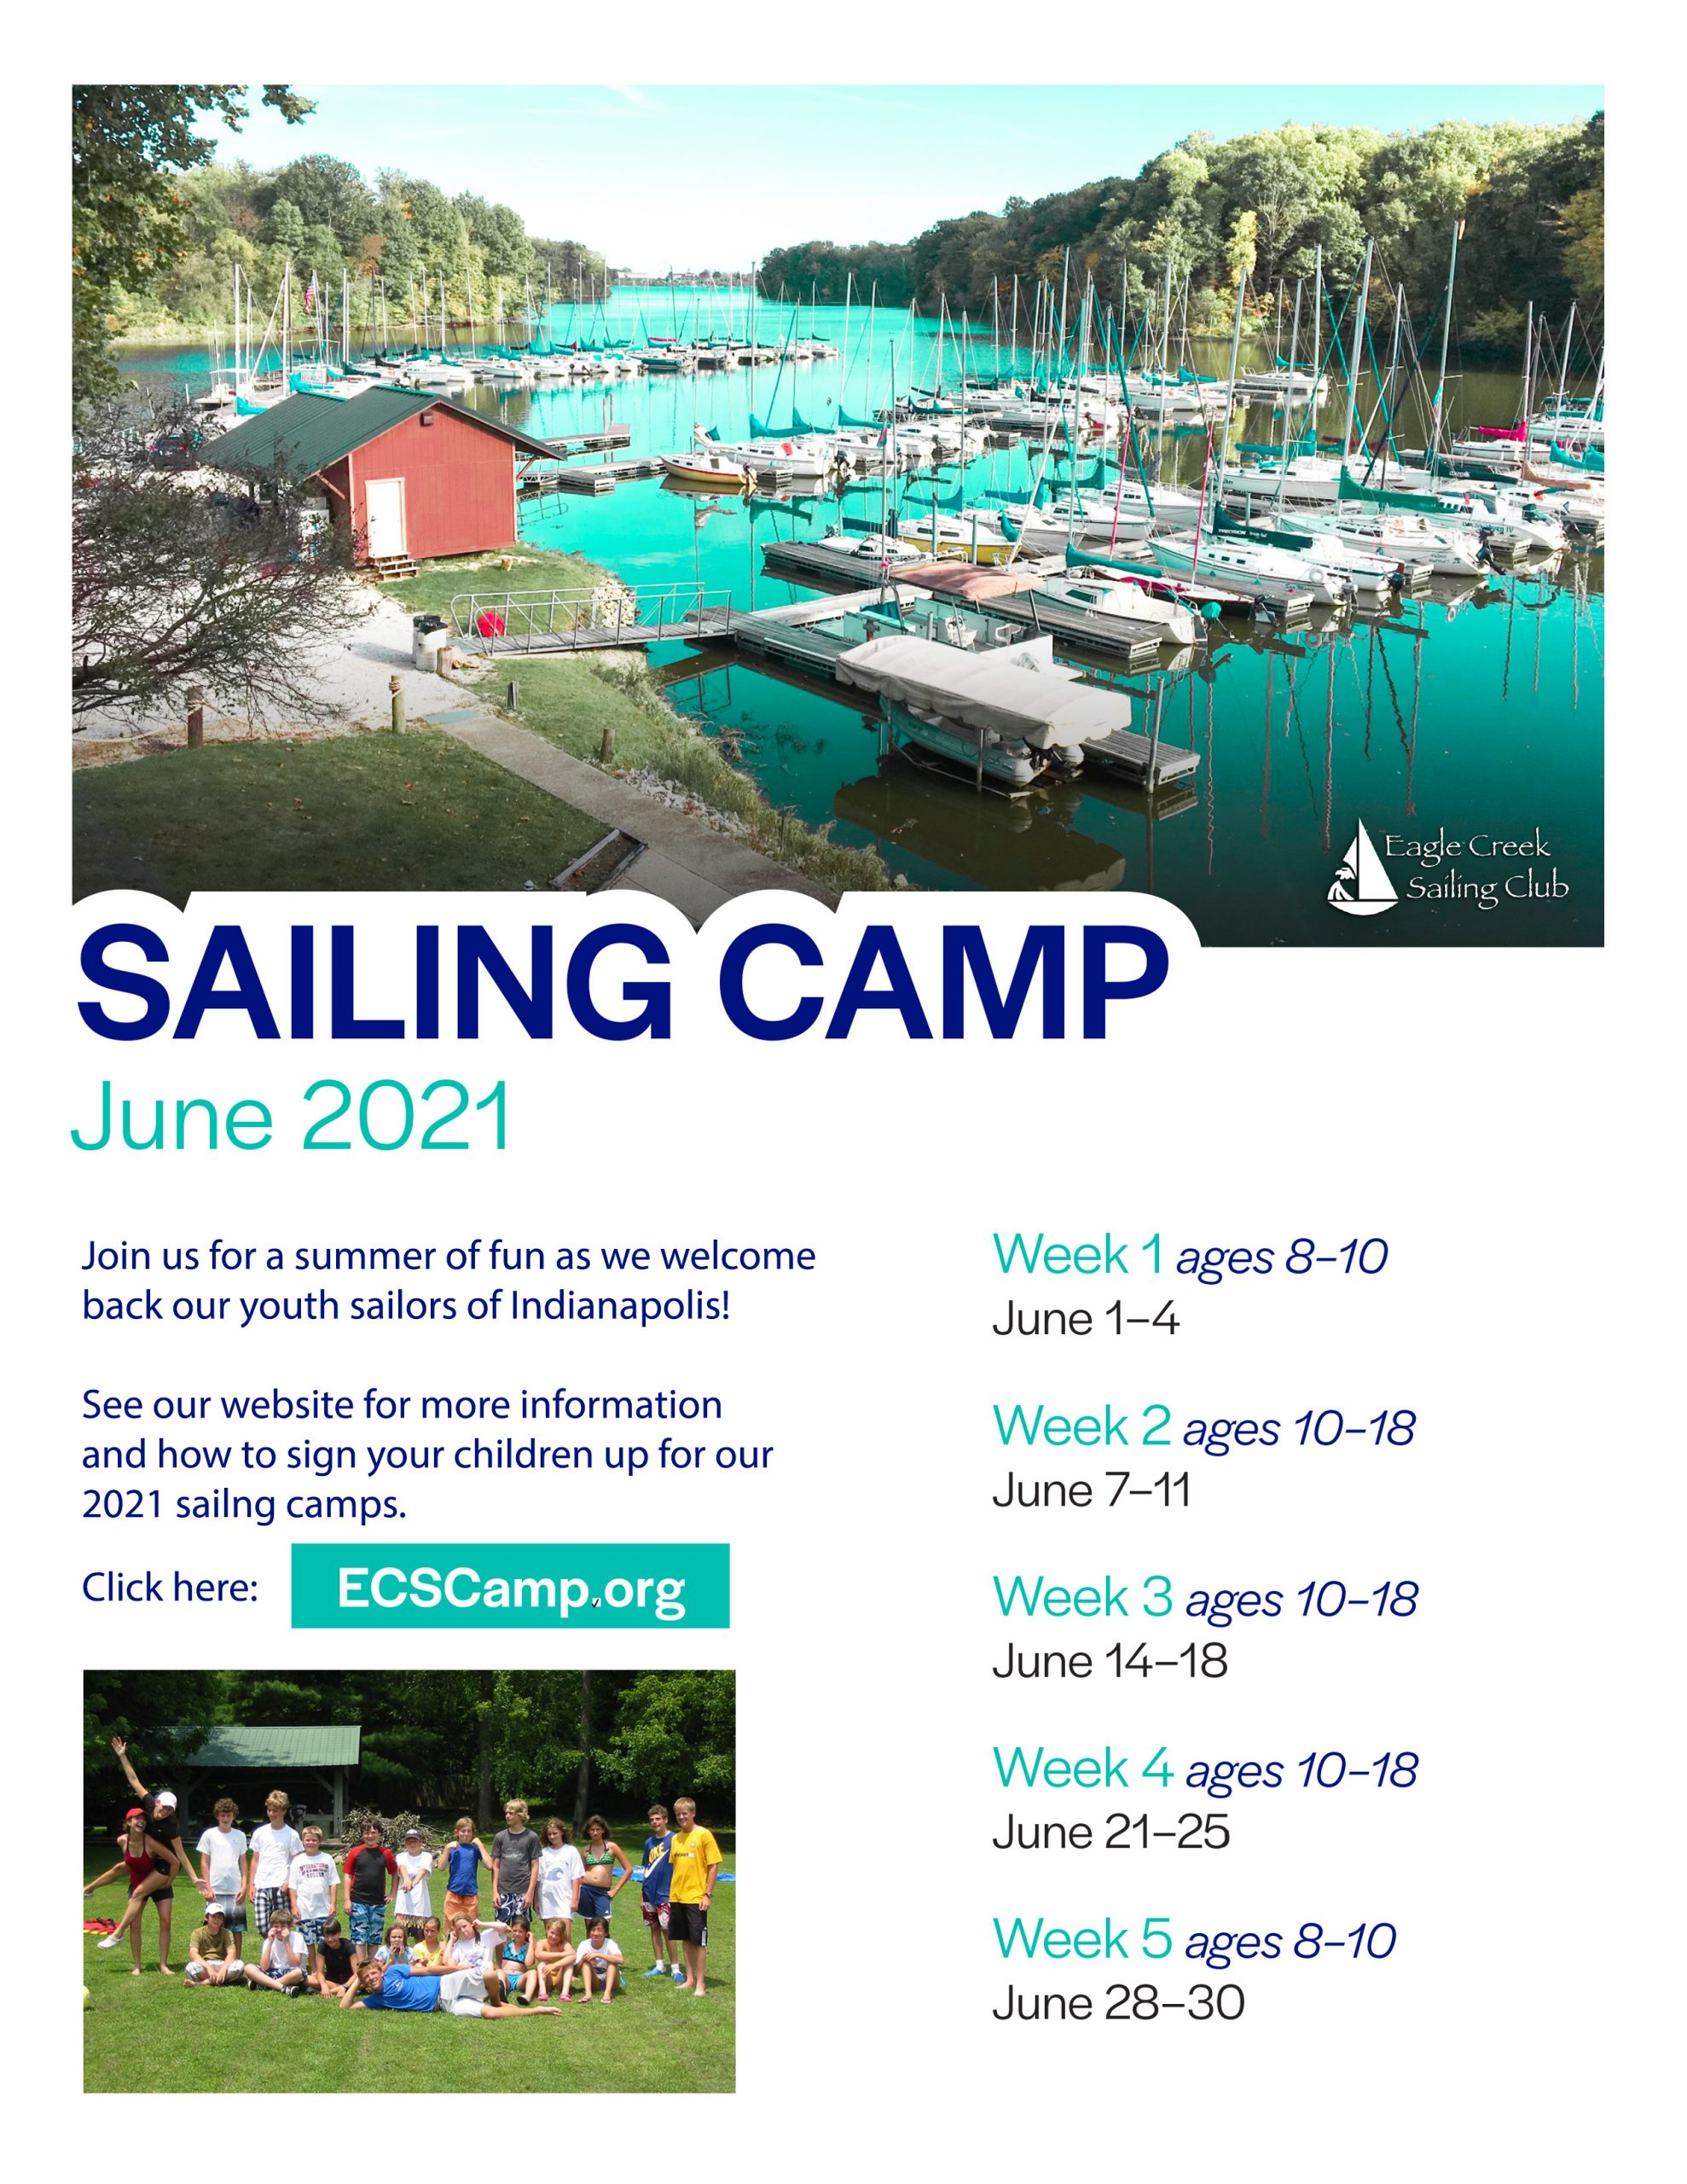 ecsc 2021 junior sailing camp